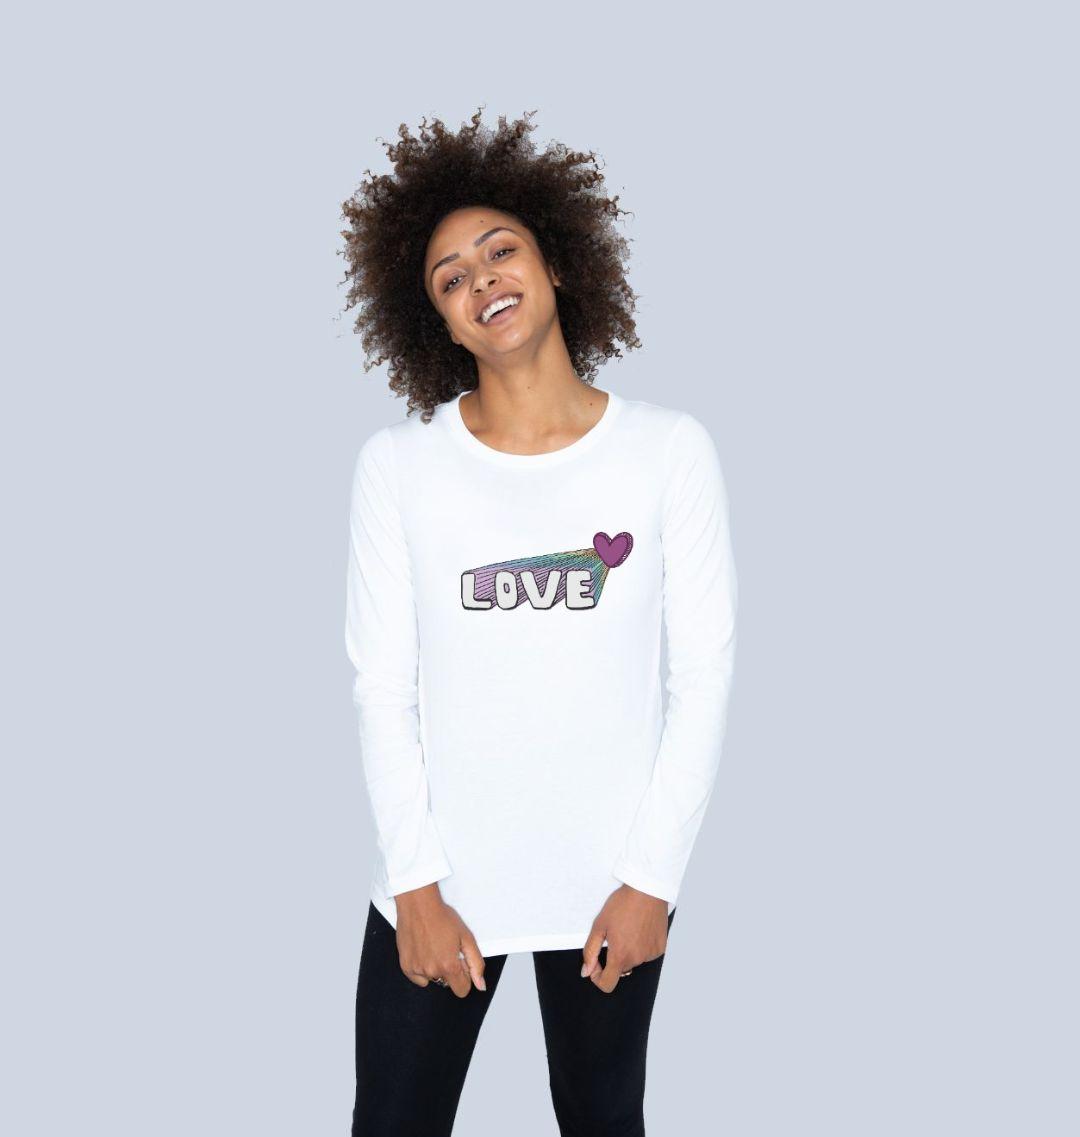 Women's Let Your Love Shine Longsleeve Top Kind Shop